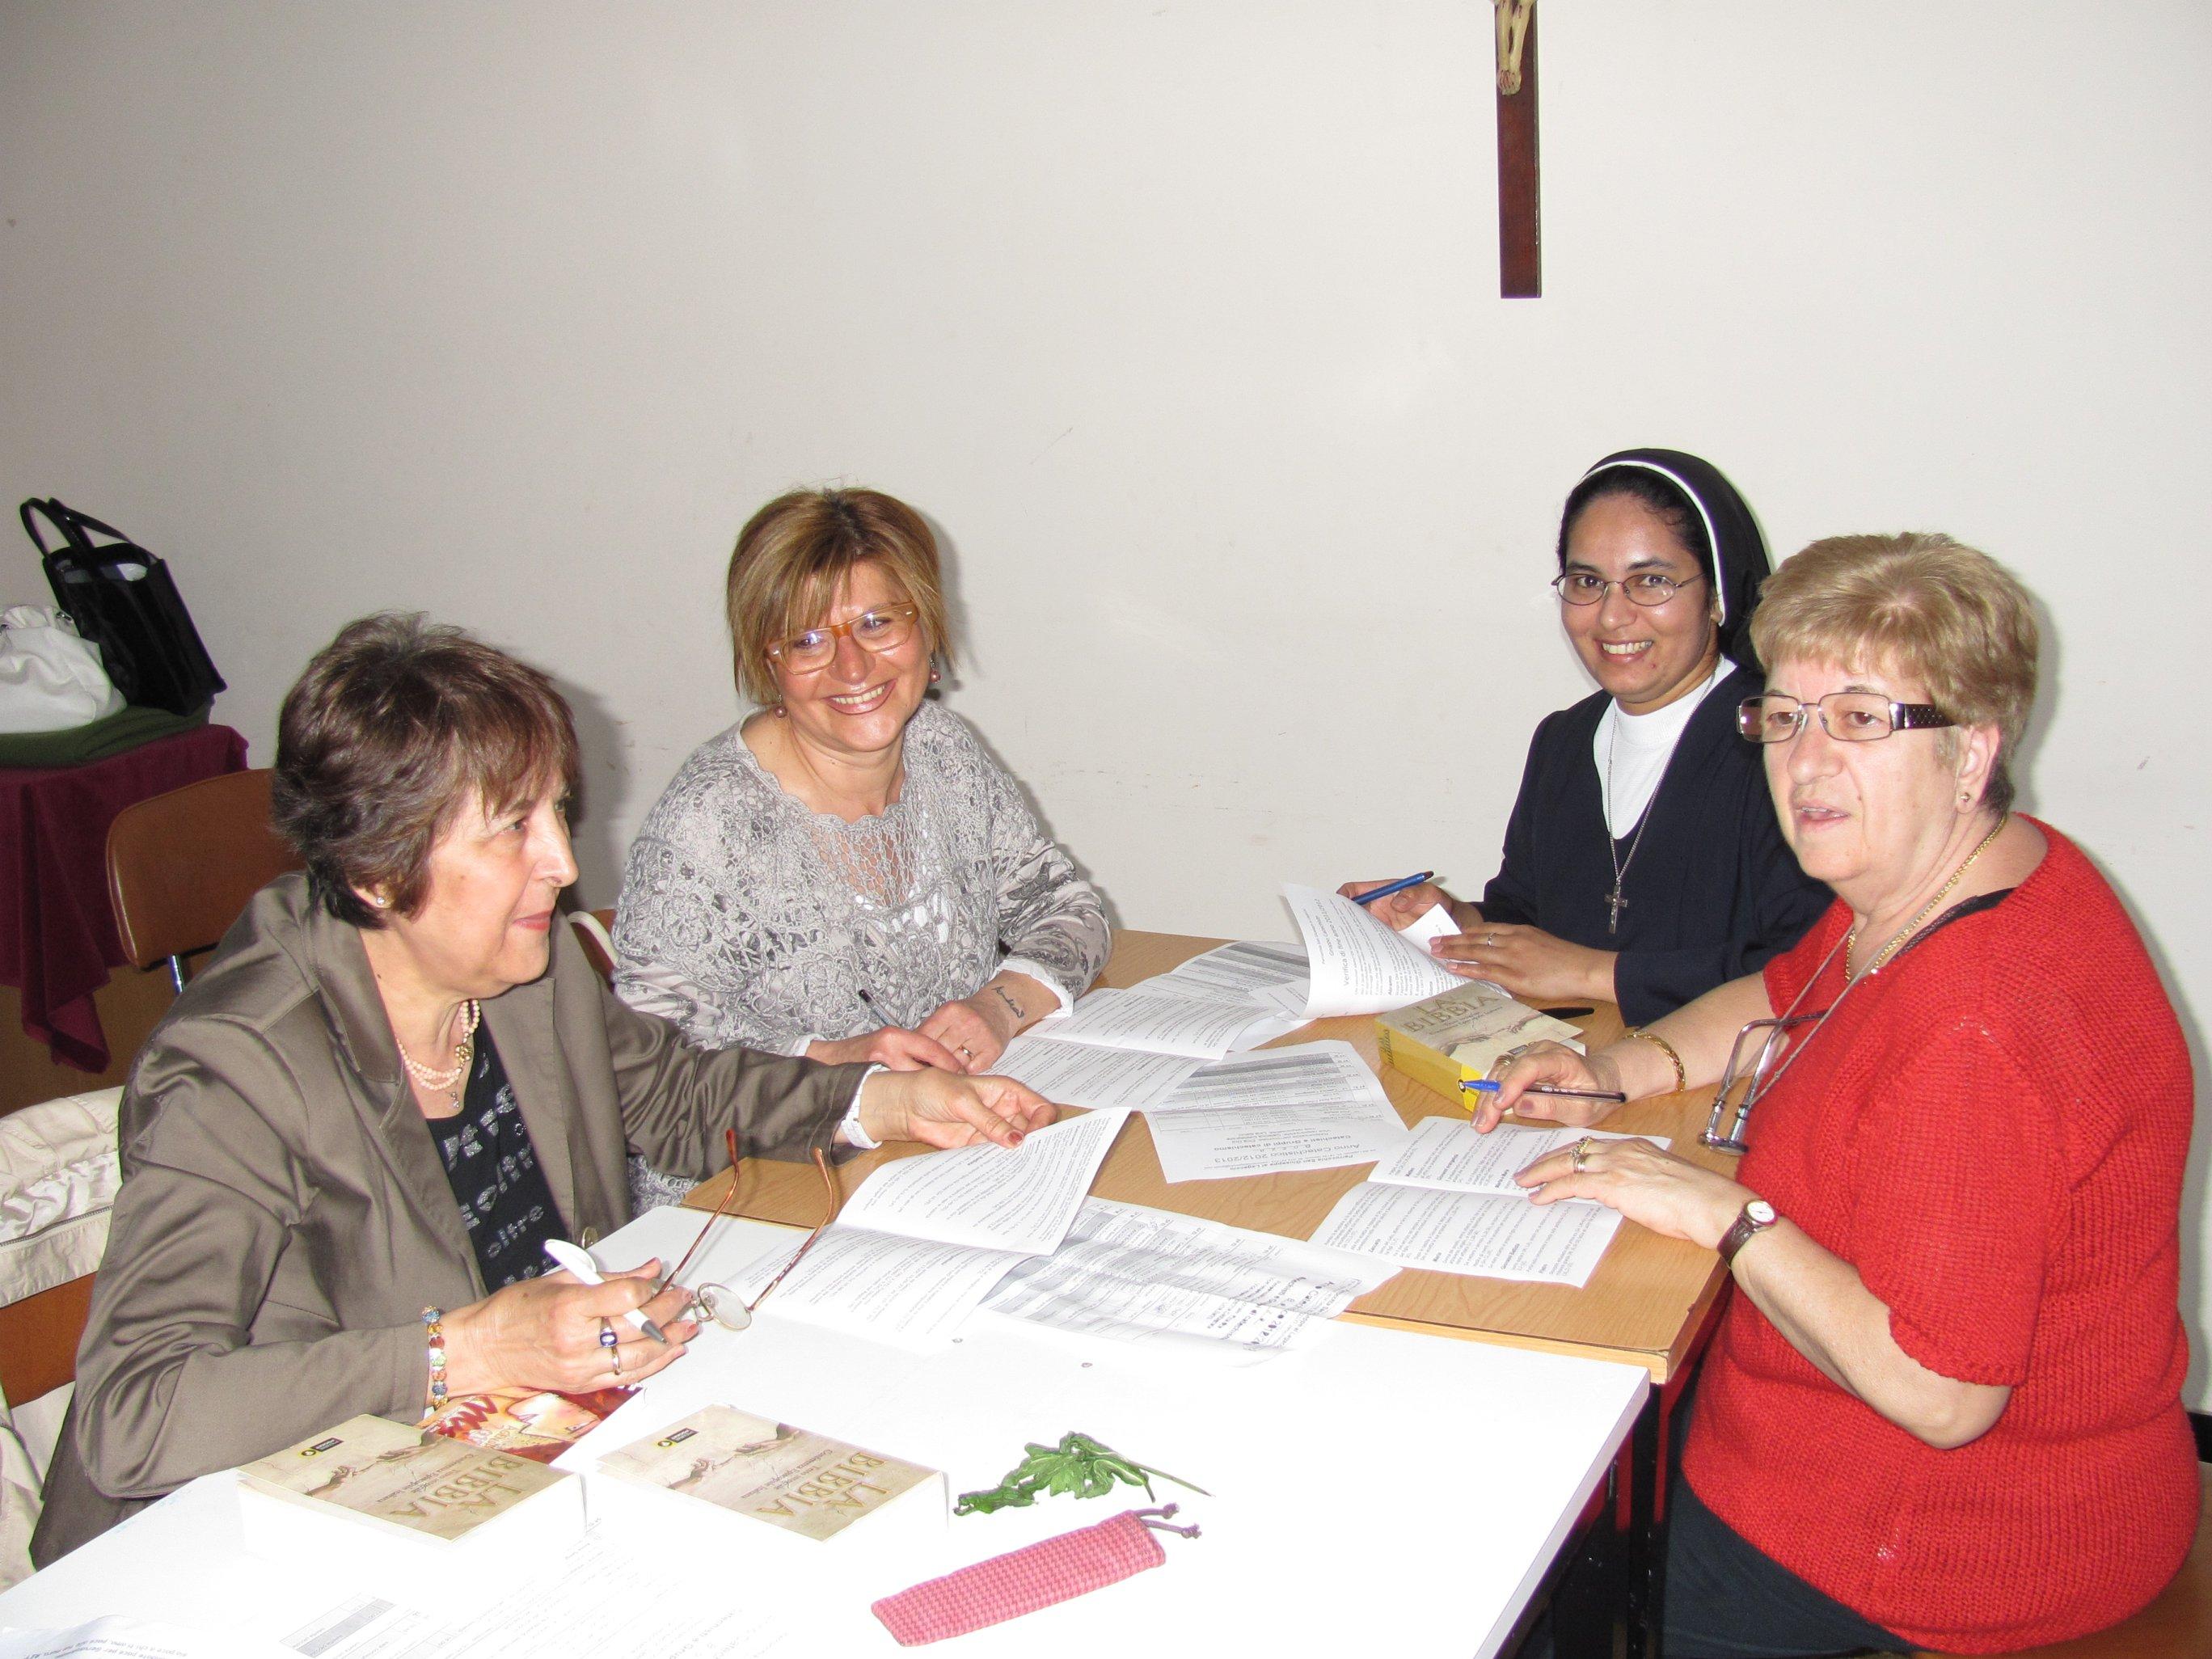 verifica_catechiste_2012-06-11-18-18-06